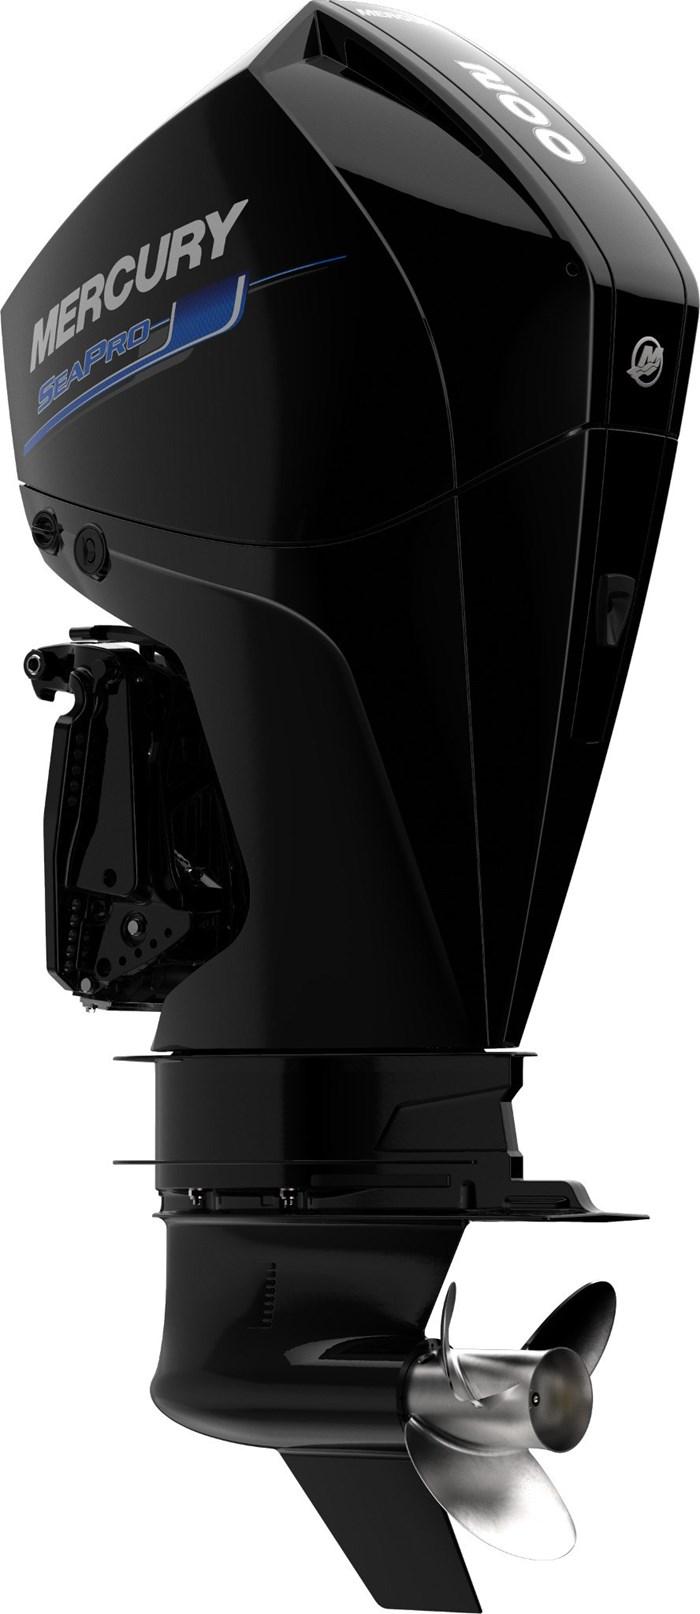 2020 Mercury 200XL V-6 4-Stroke SeaPro Commercial Outboard Photo 5 of 22